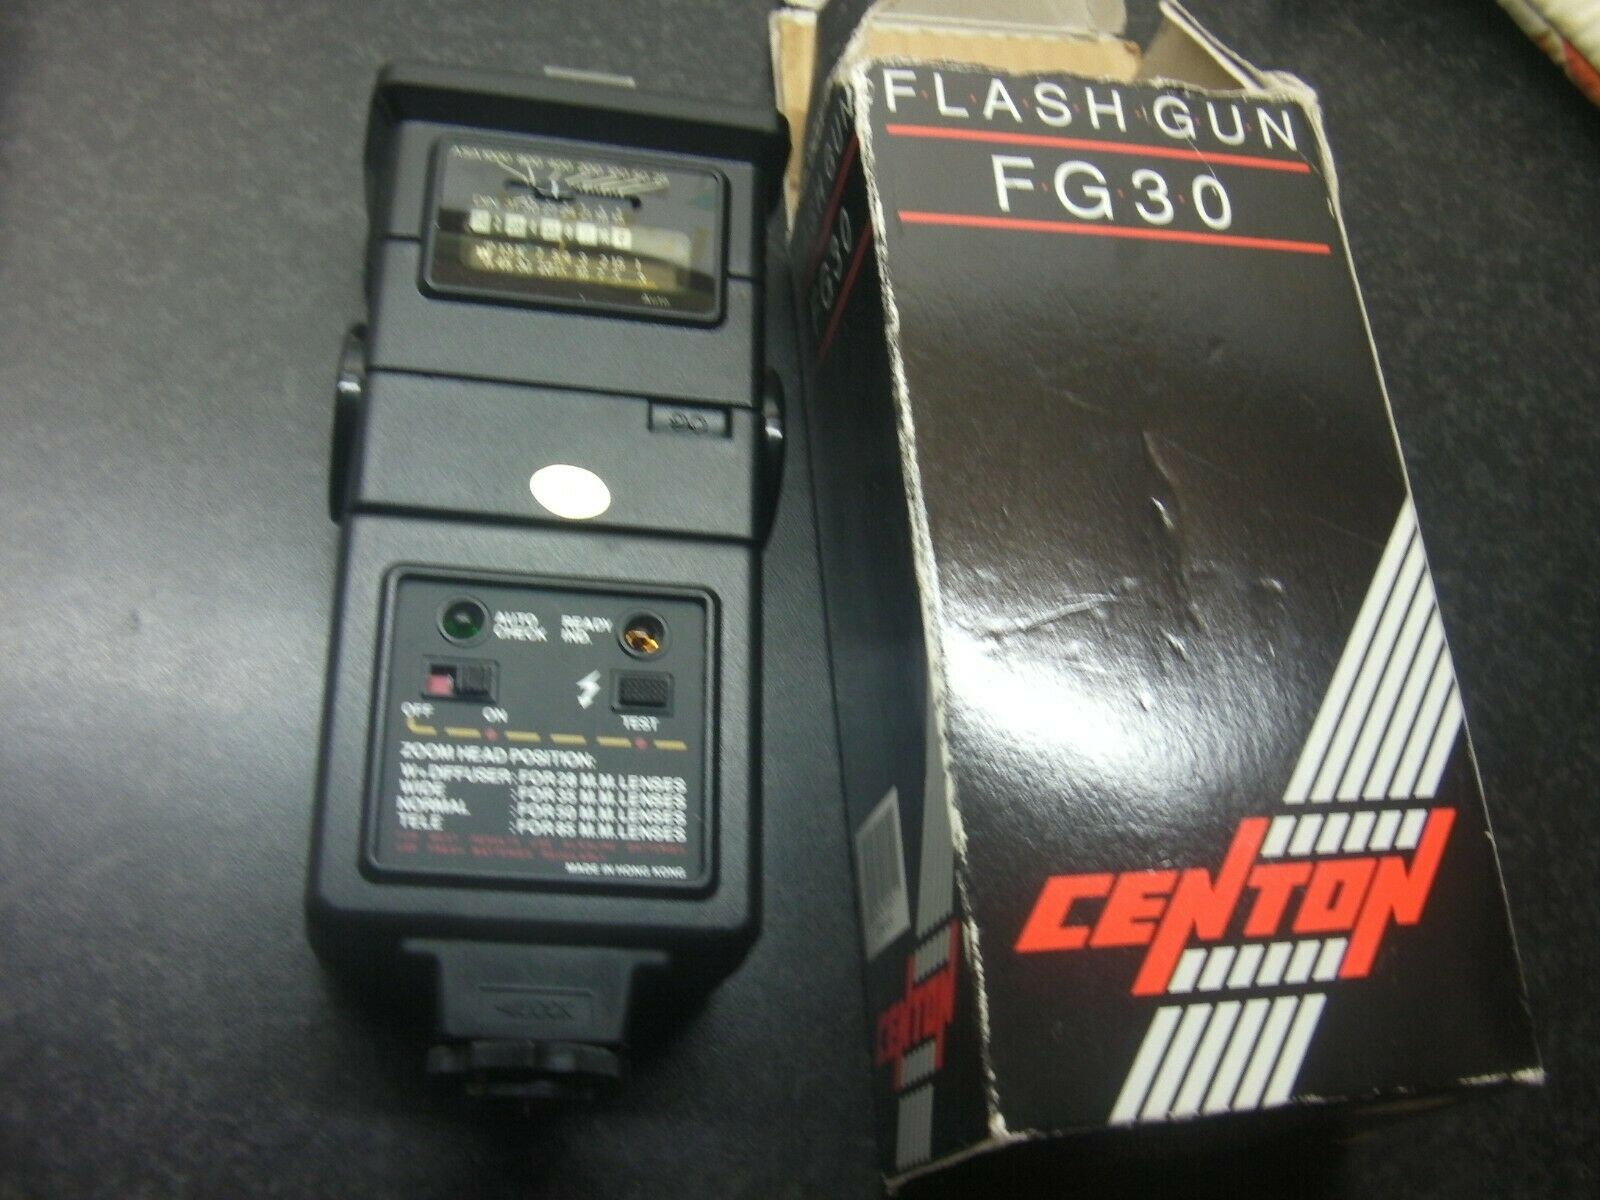 Centon FG30 Bounce & Zoom & Swivel Flash, Boxed, Tested, vgc